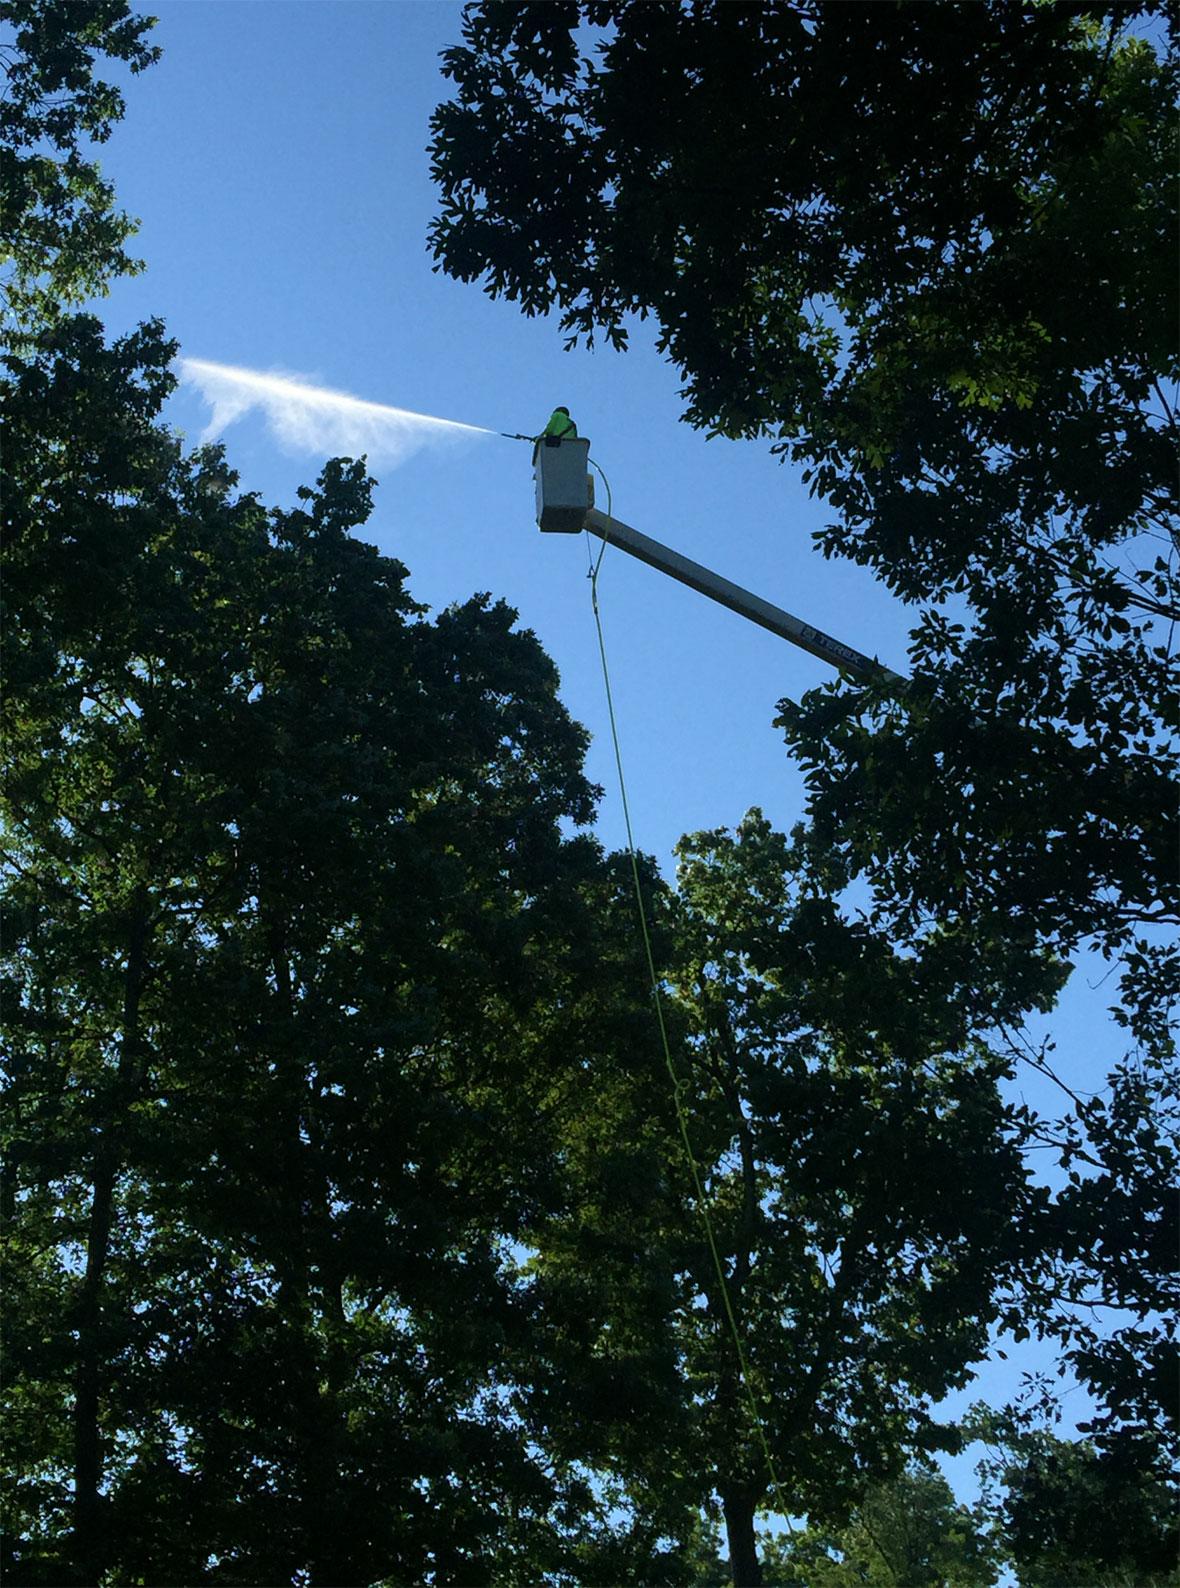 tree-shrub-pest-control-services-lehigh-valley-pa